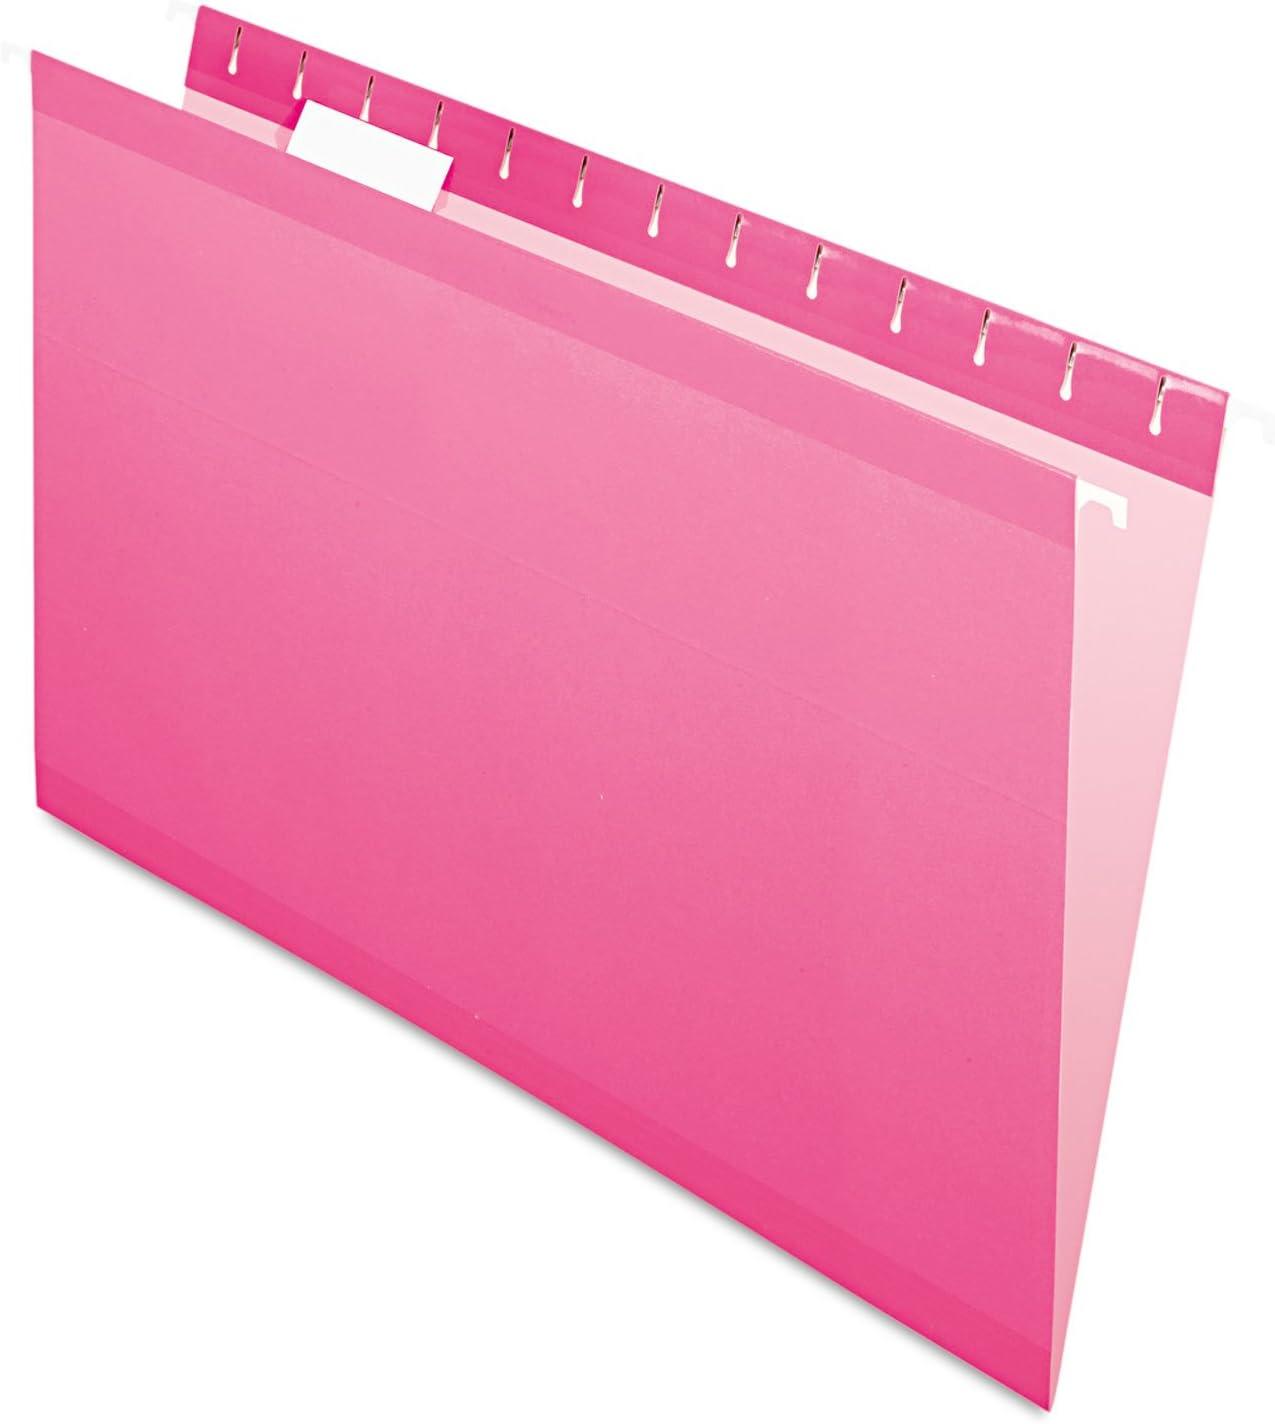 PFX415315PIN - Pendaflex by New sales Hanging Rapid rise Folder